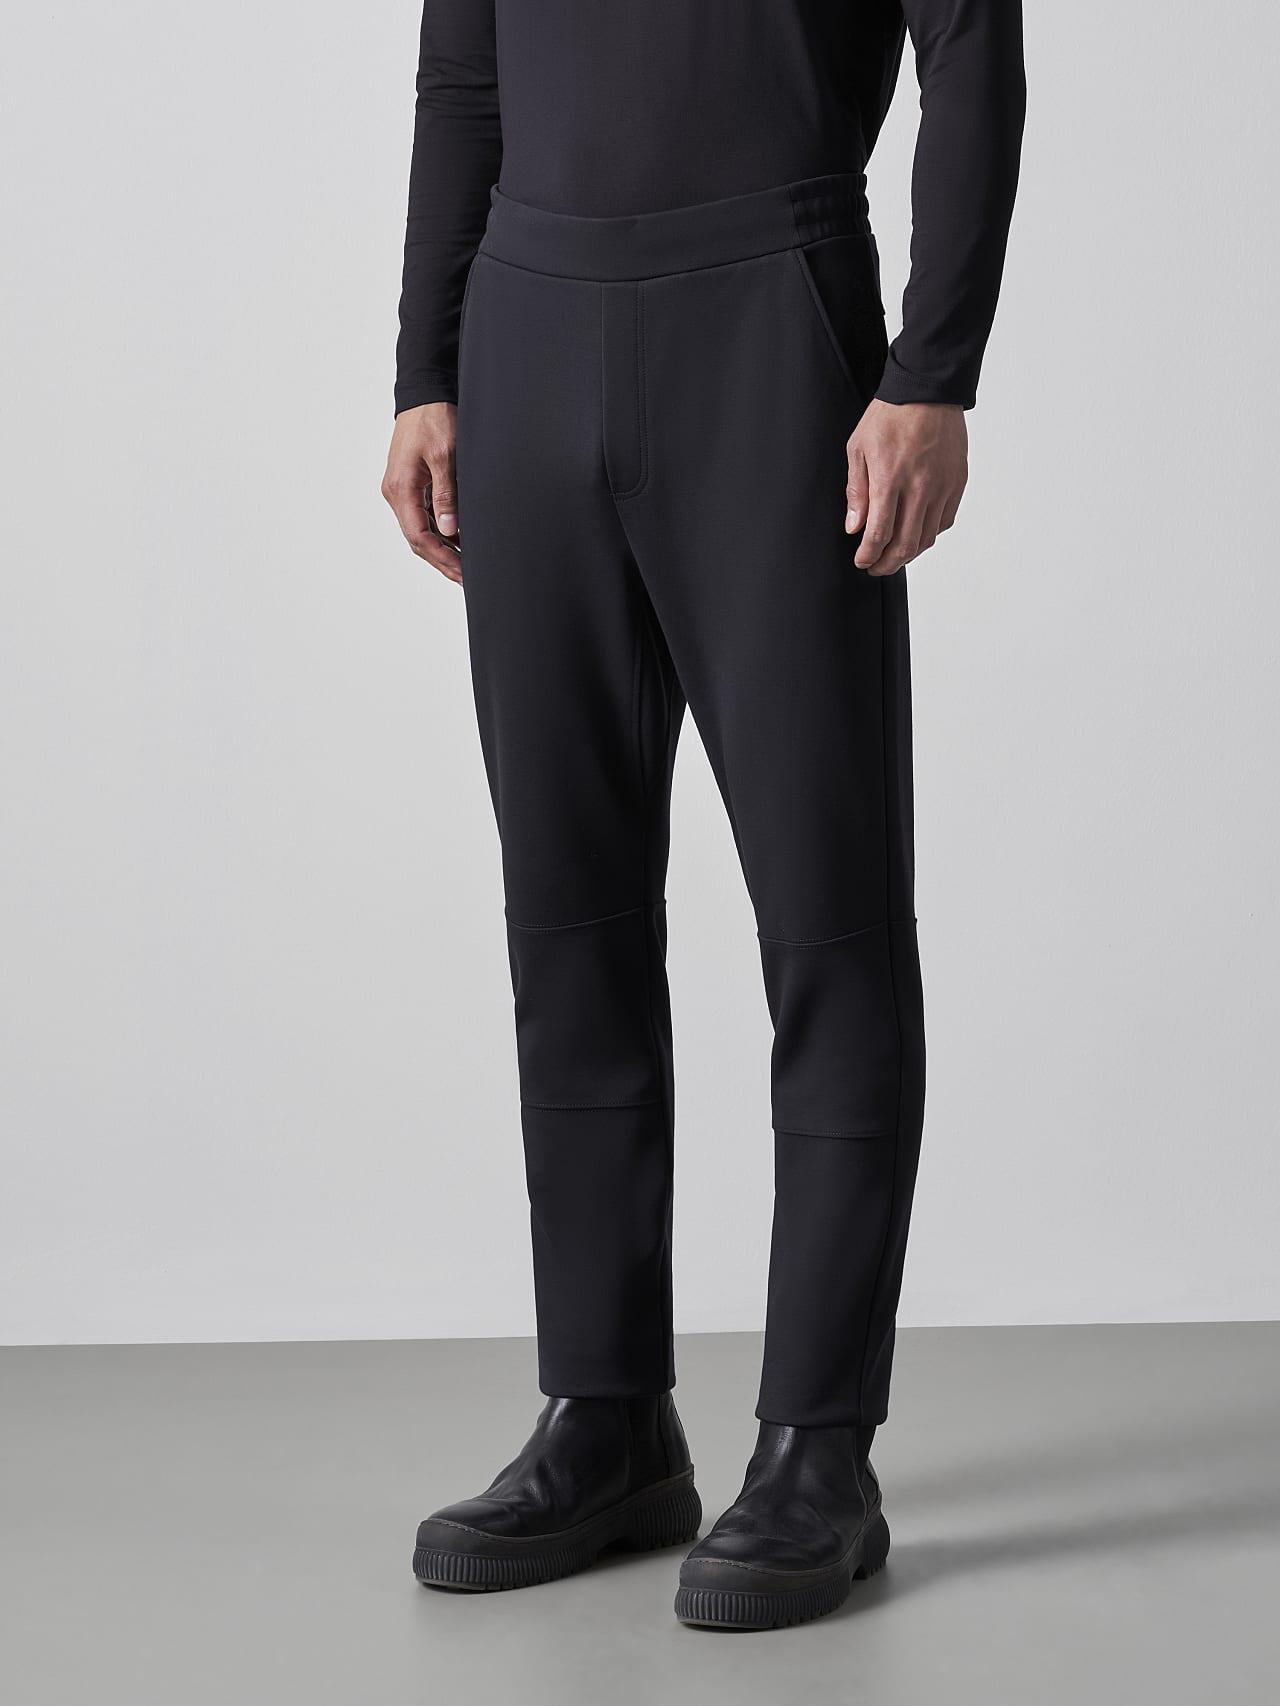 PRYK V7.Y5.02 Premium Sweatpants black Front Alpha Tauri